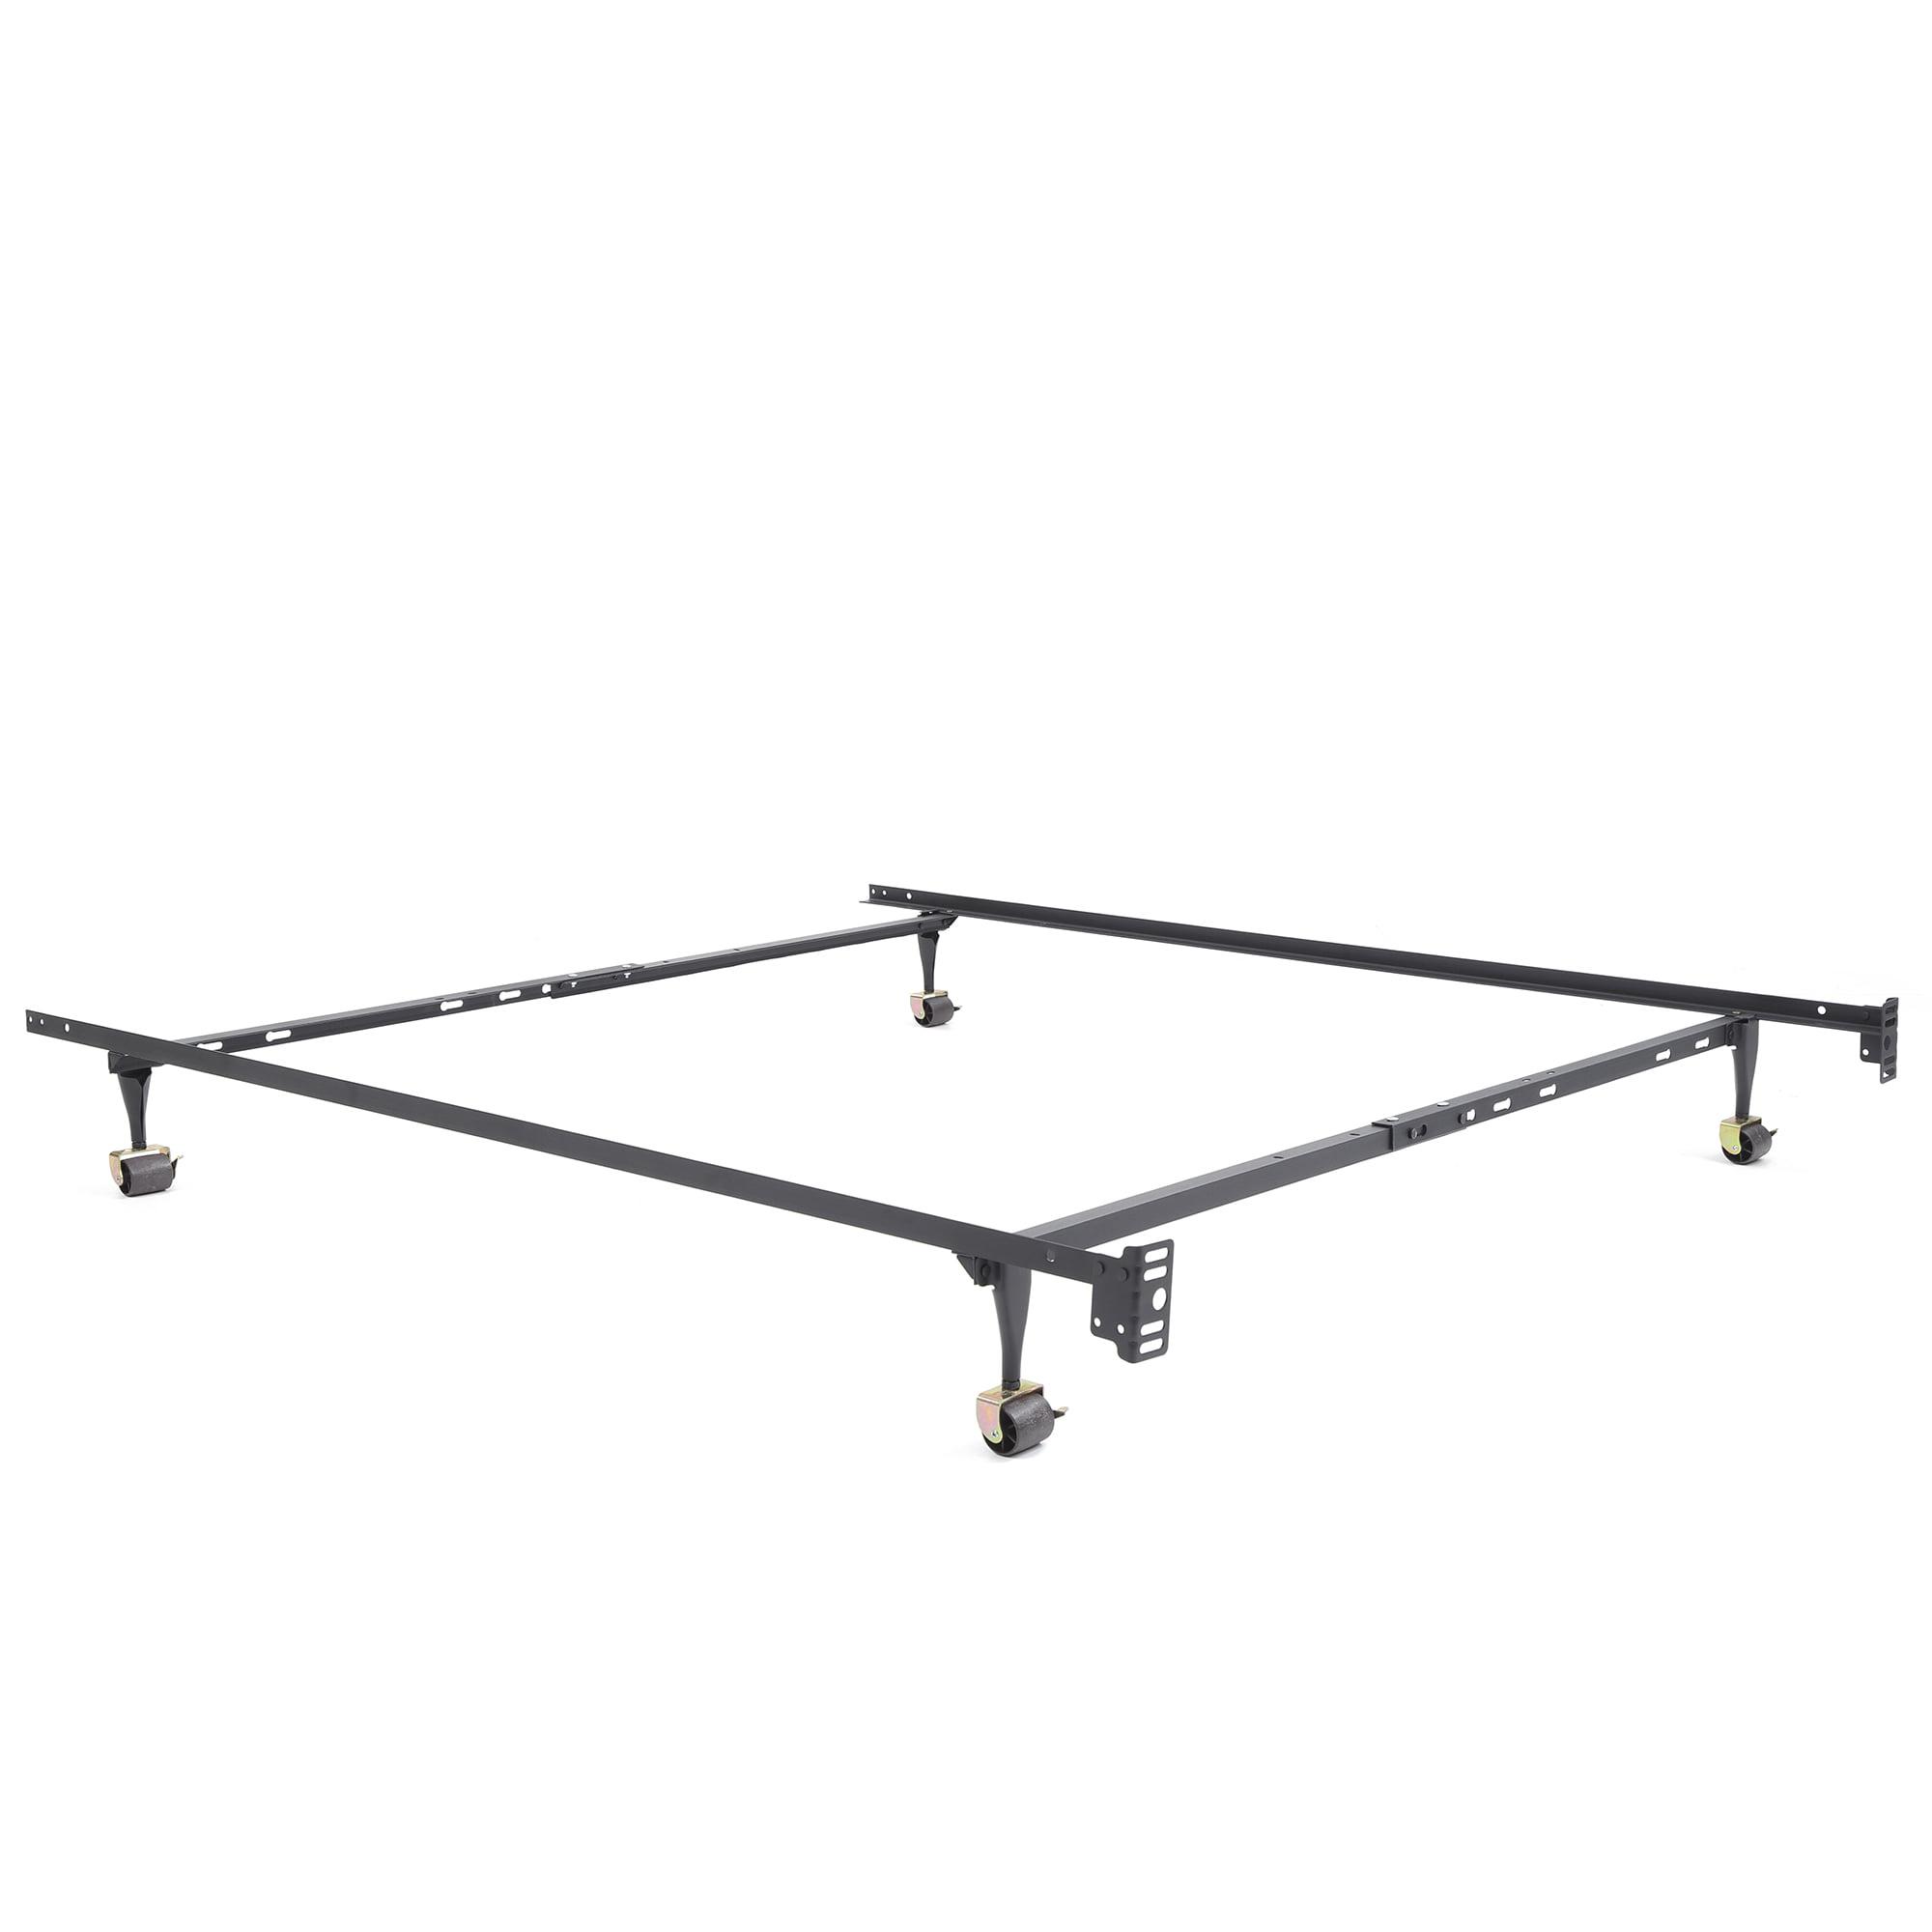 Modern Sleep Standard Adjustable Metal Bed Frame Multiple Sizes Walmart Com Walmart Com